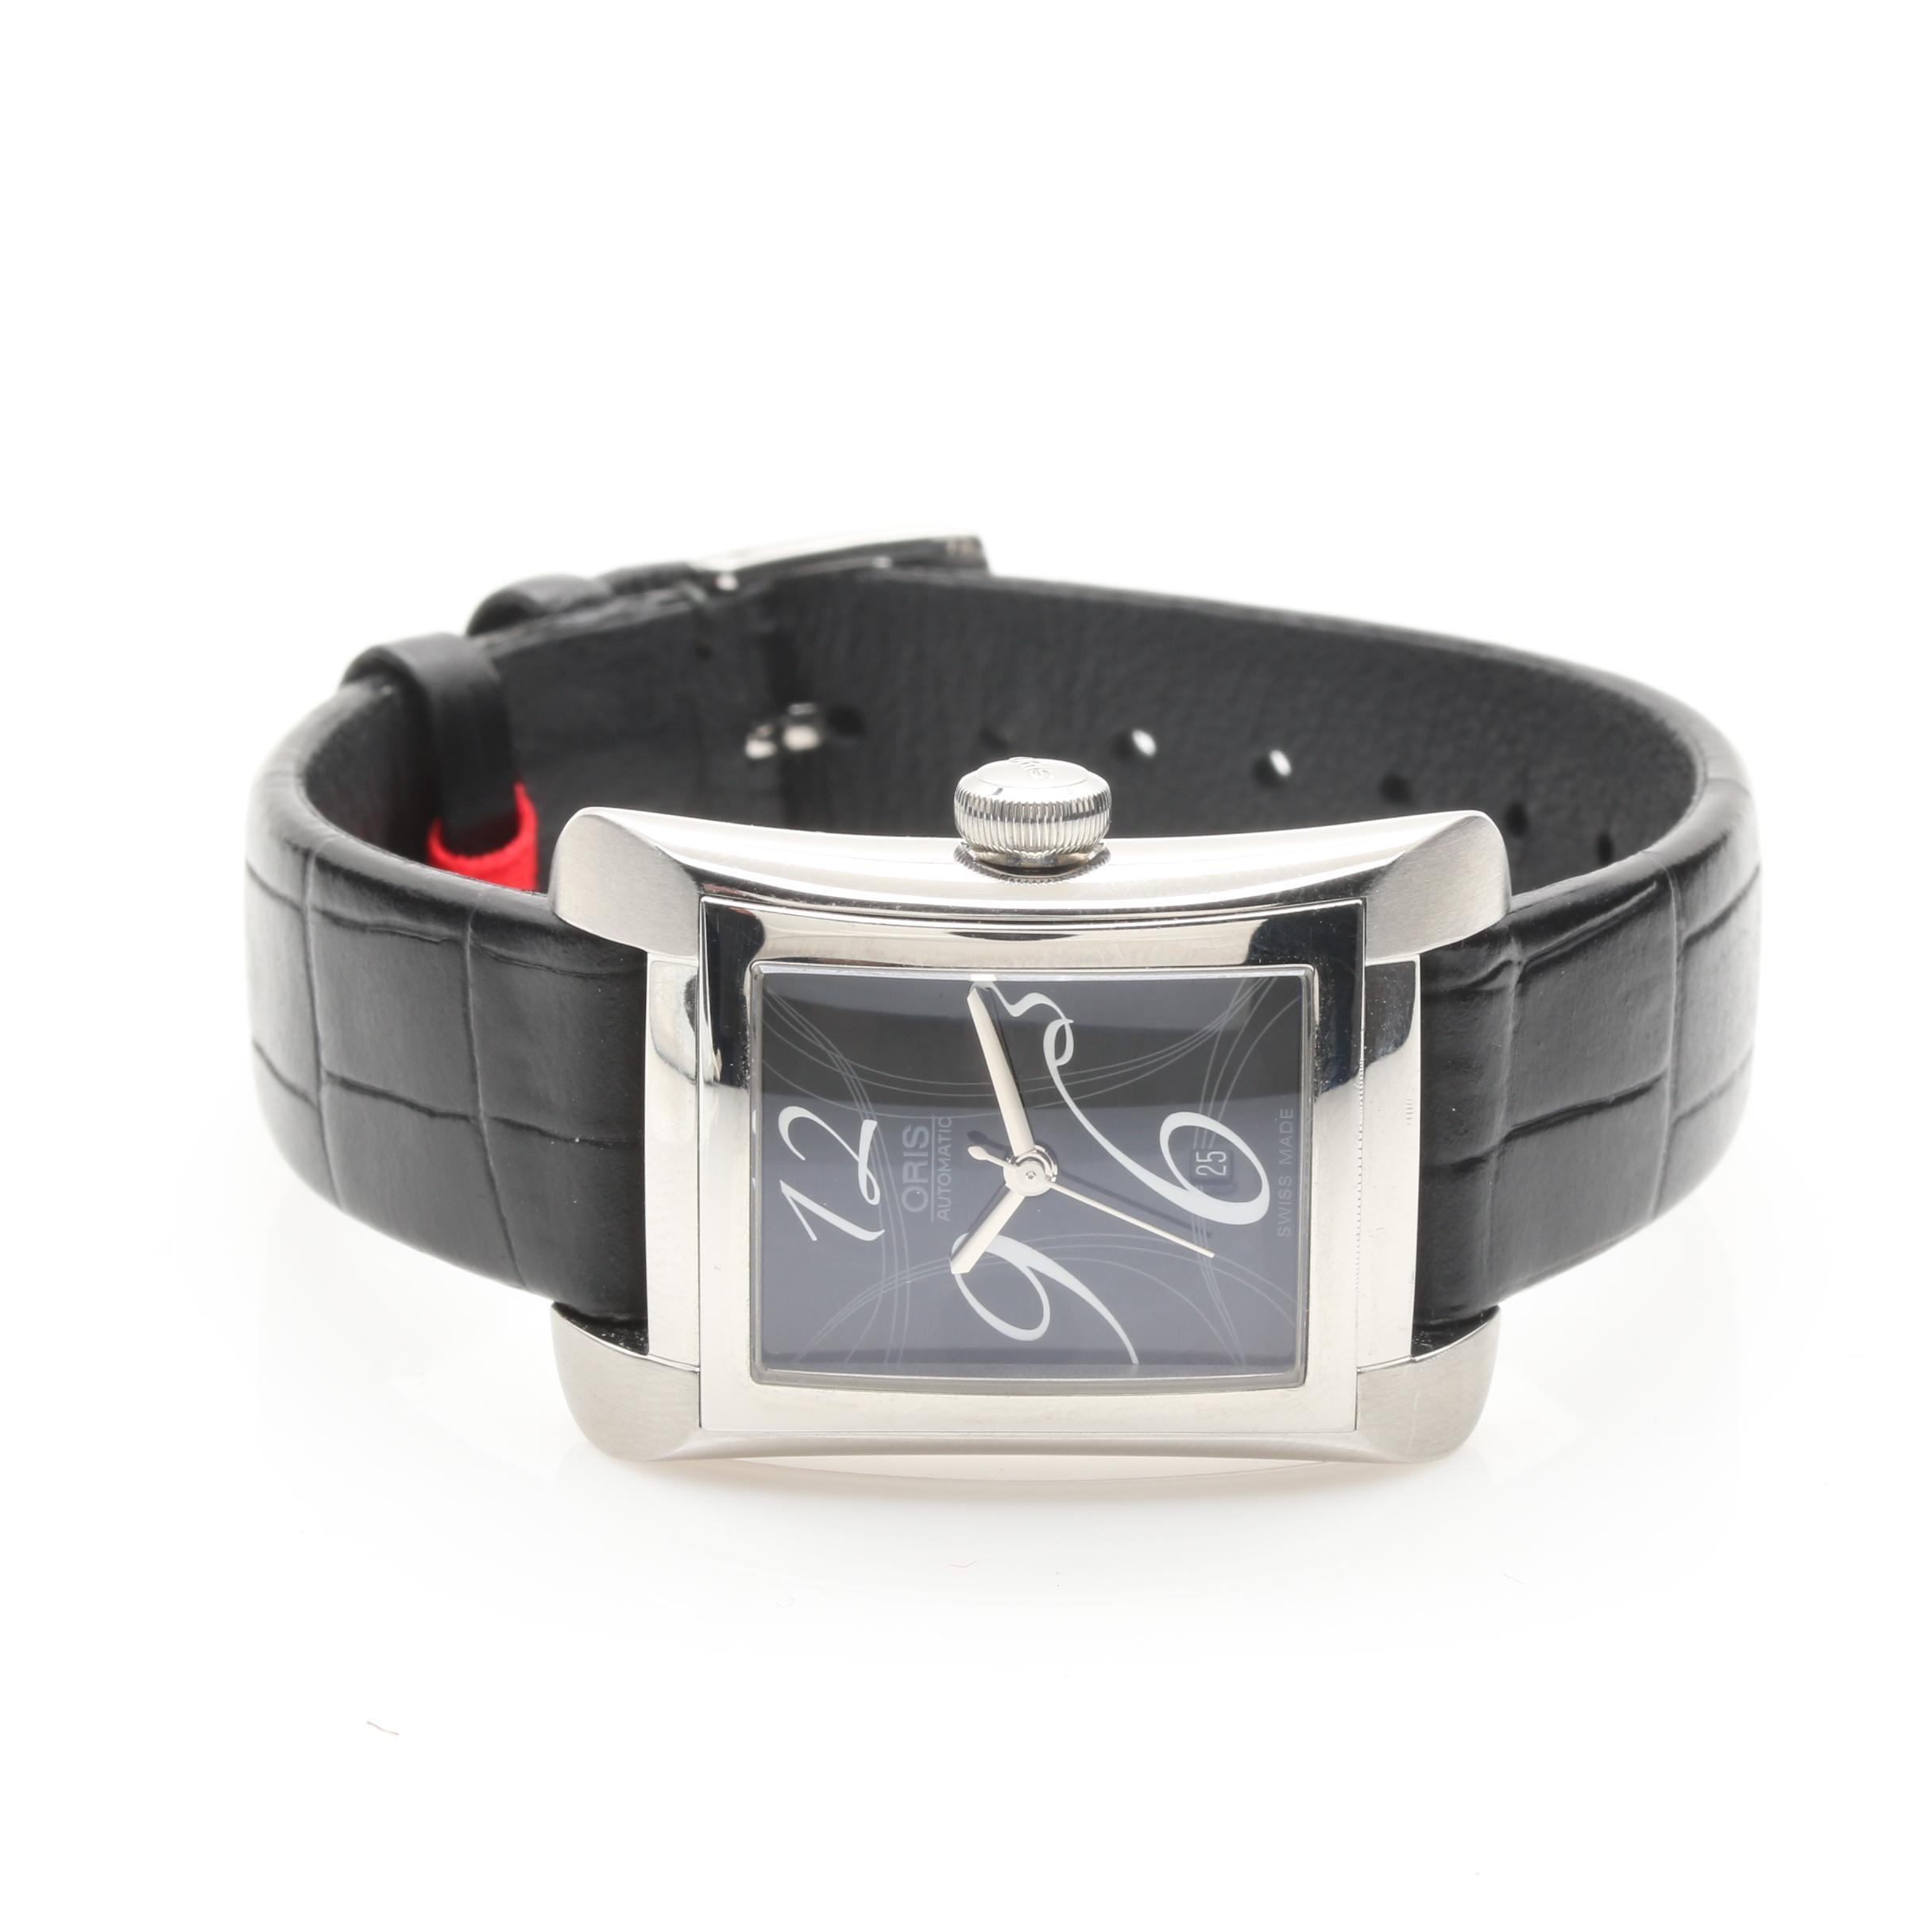 Silver Tone Oris Automatic Wristwatch